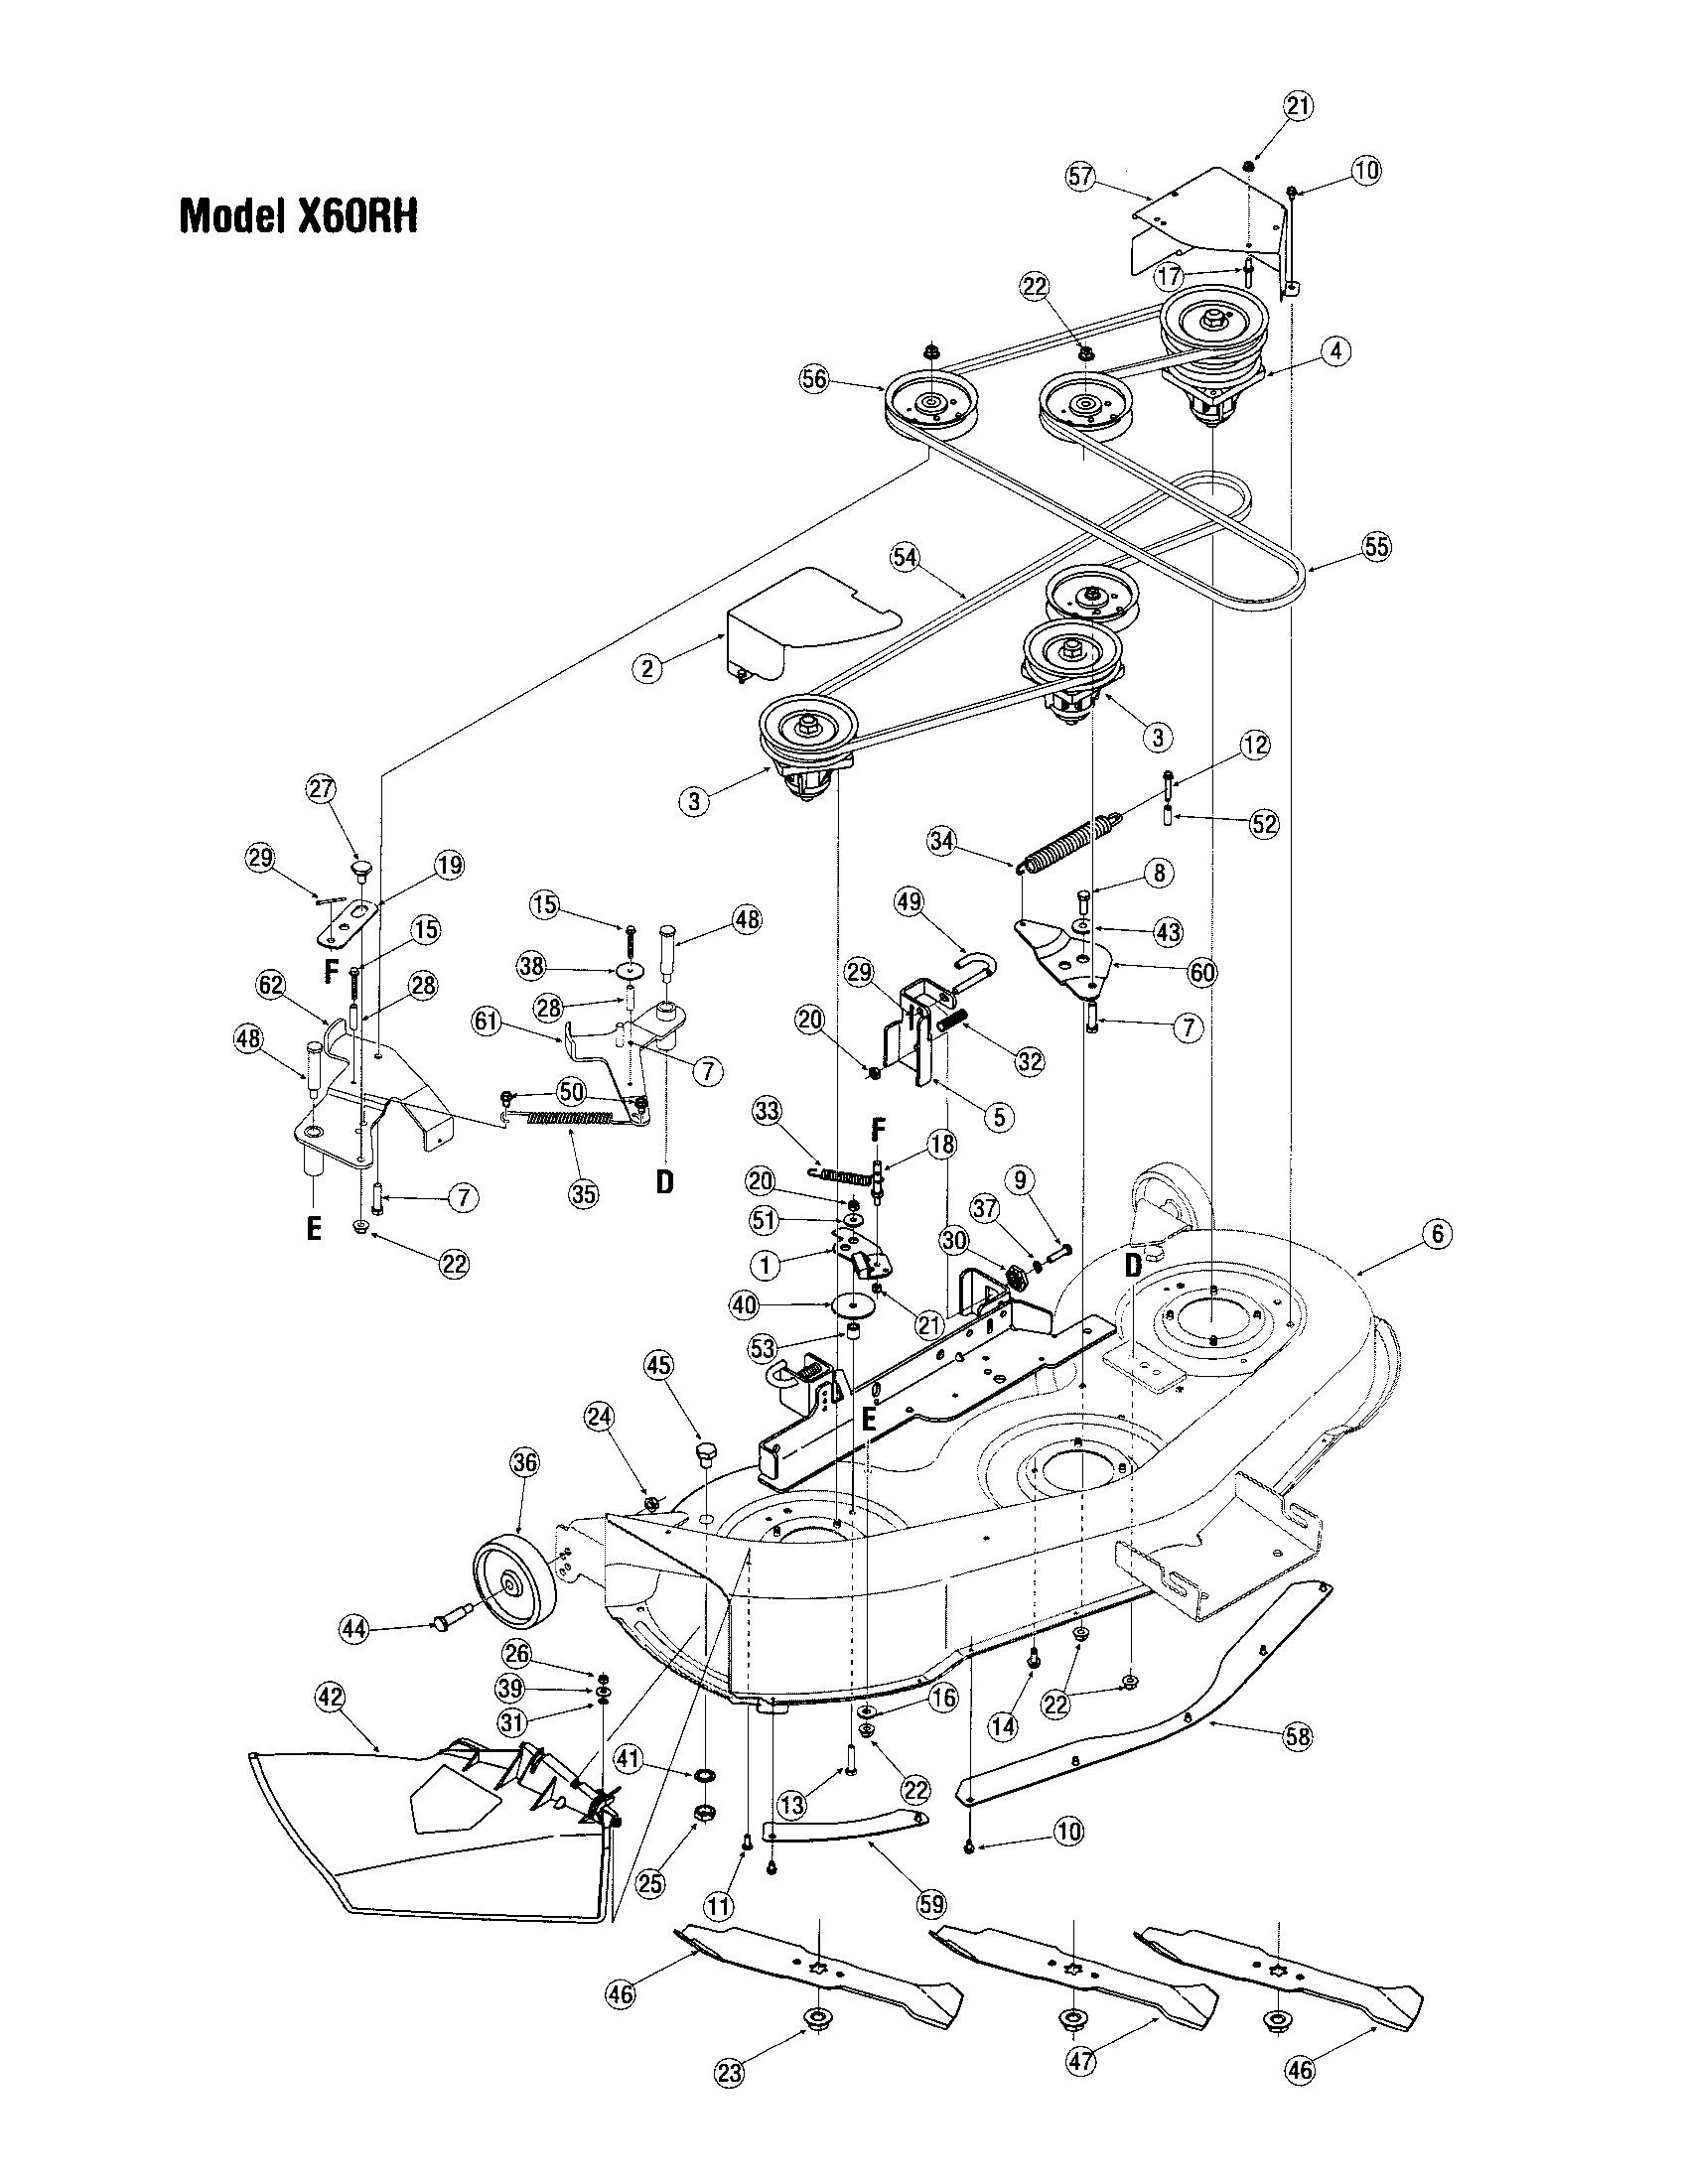 DECK-MODEL X60RH Diagram & Parts List for Model LX420 Toro